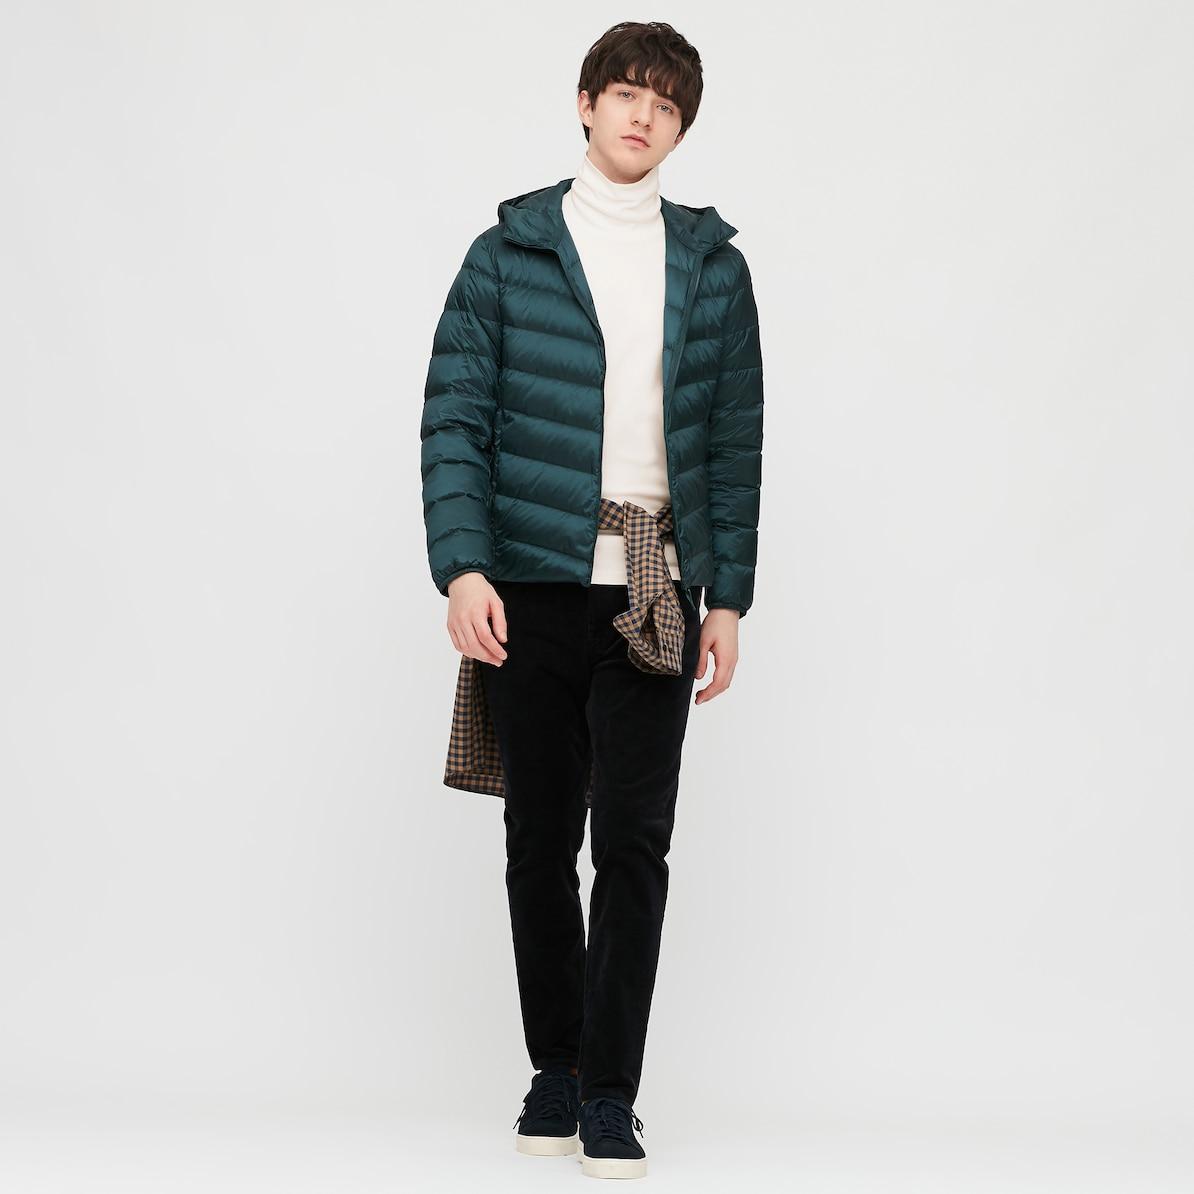 f:id:yamada0221:20201211122951j:plain